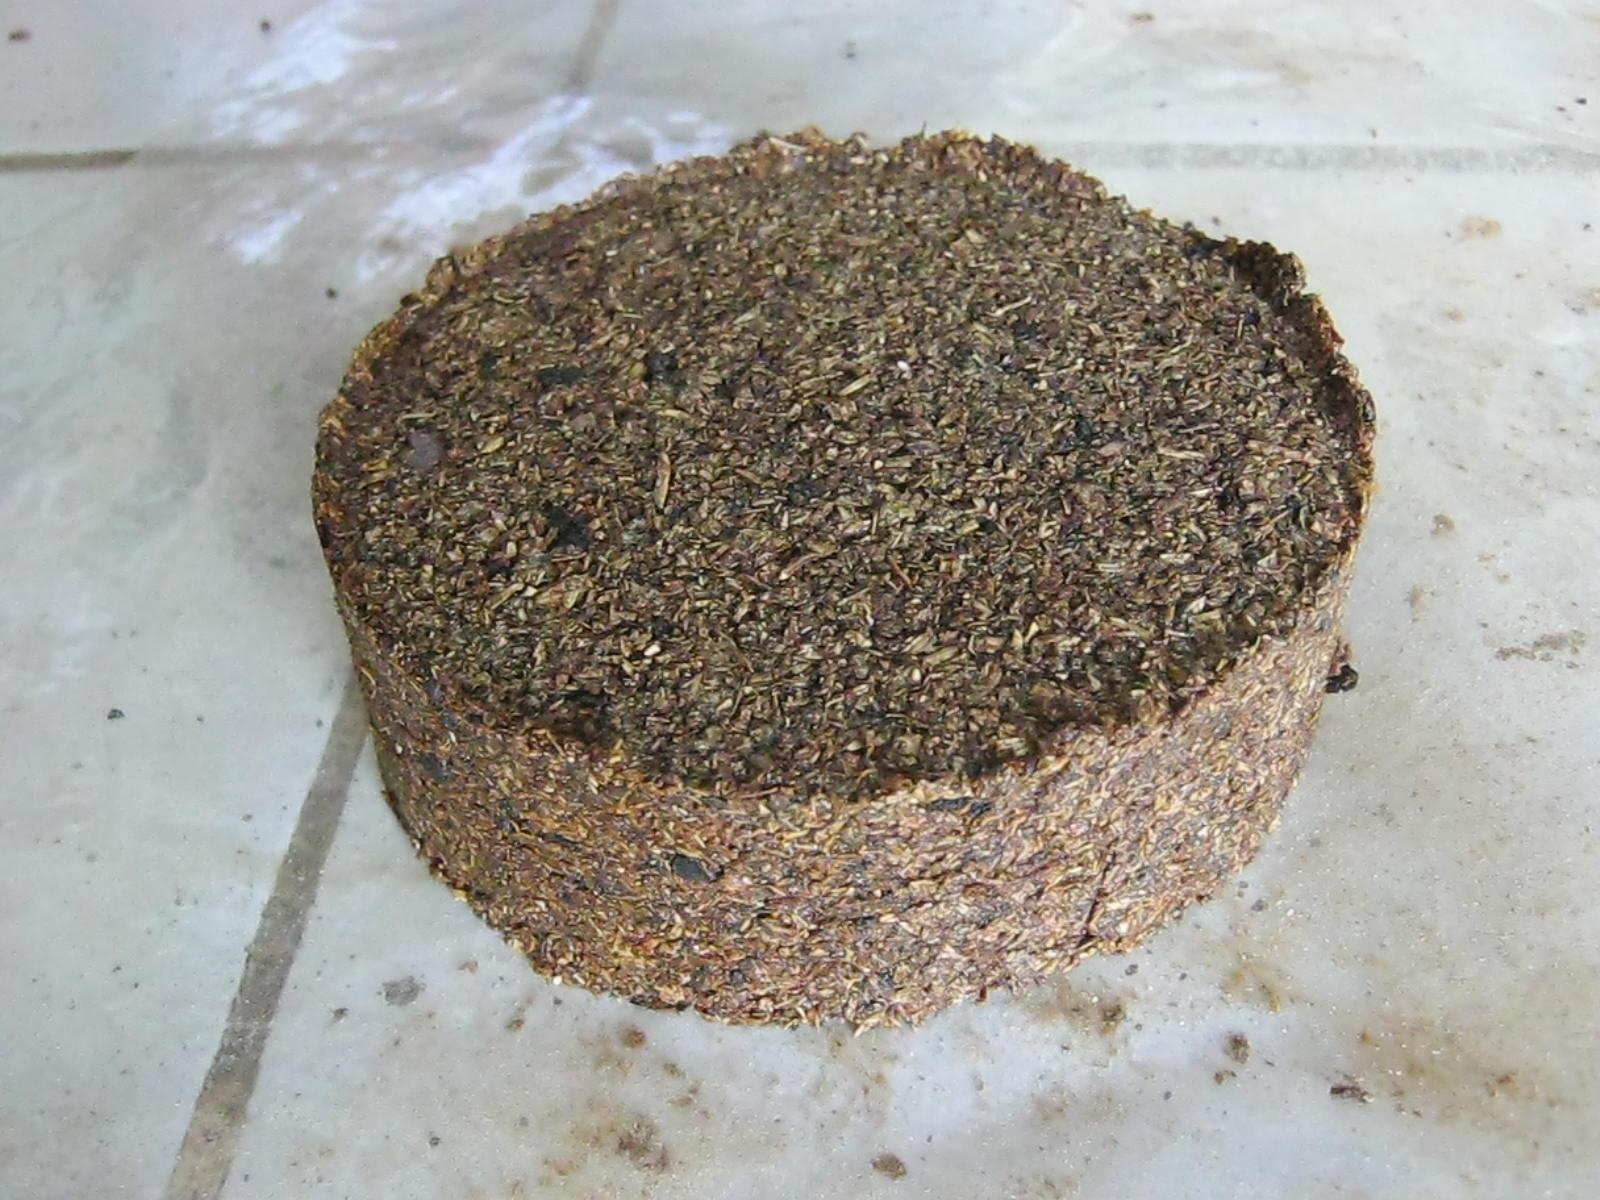 Livestock Kenya - Urea Molasses Mineral Blocks